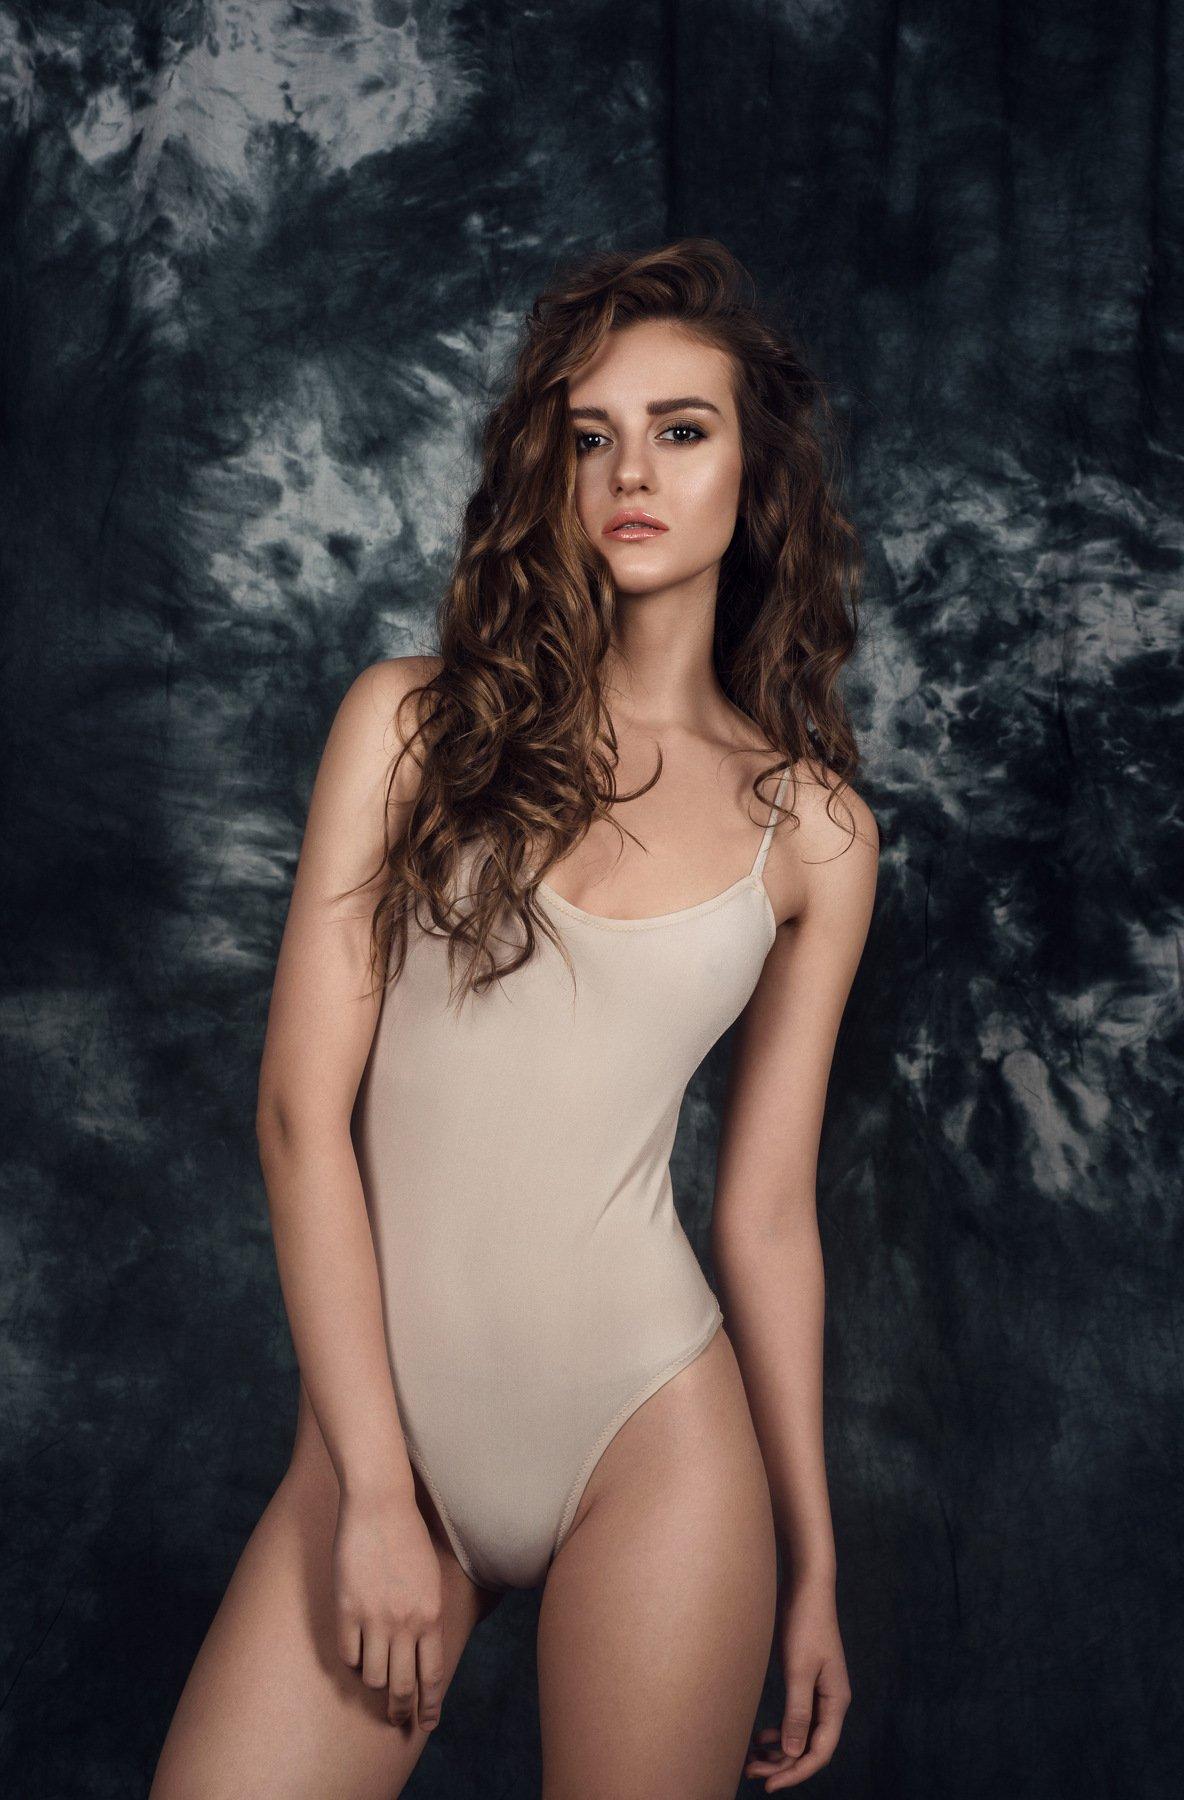 фотограф, фотосъемка, модельные тесты,  beauty, photographer, photoshooting, Никитина Алёна